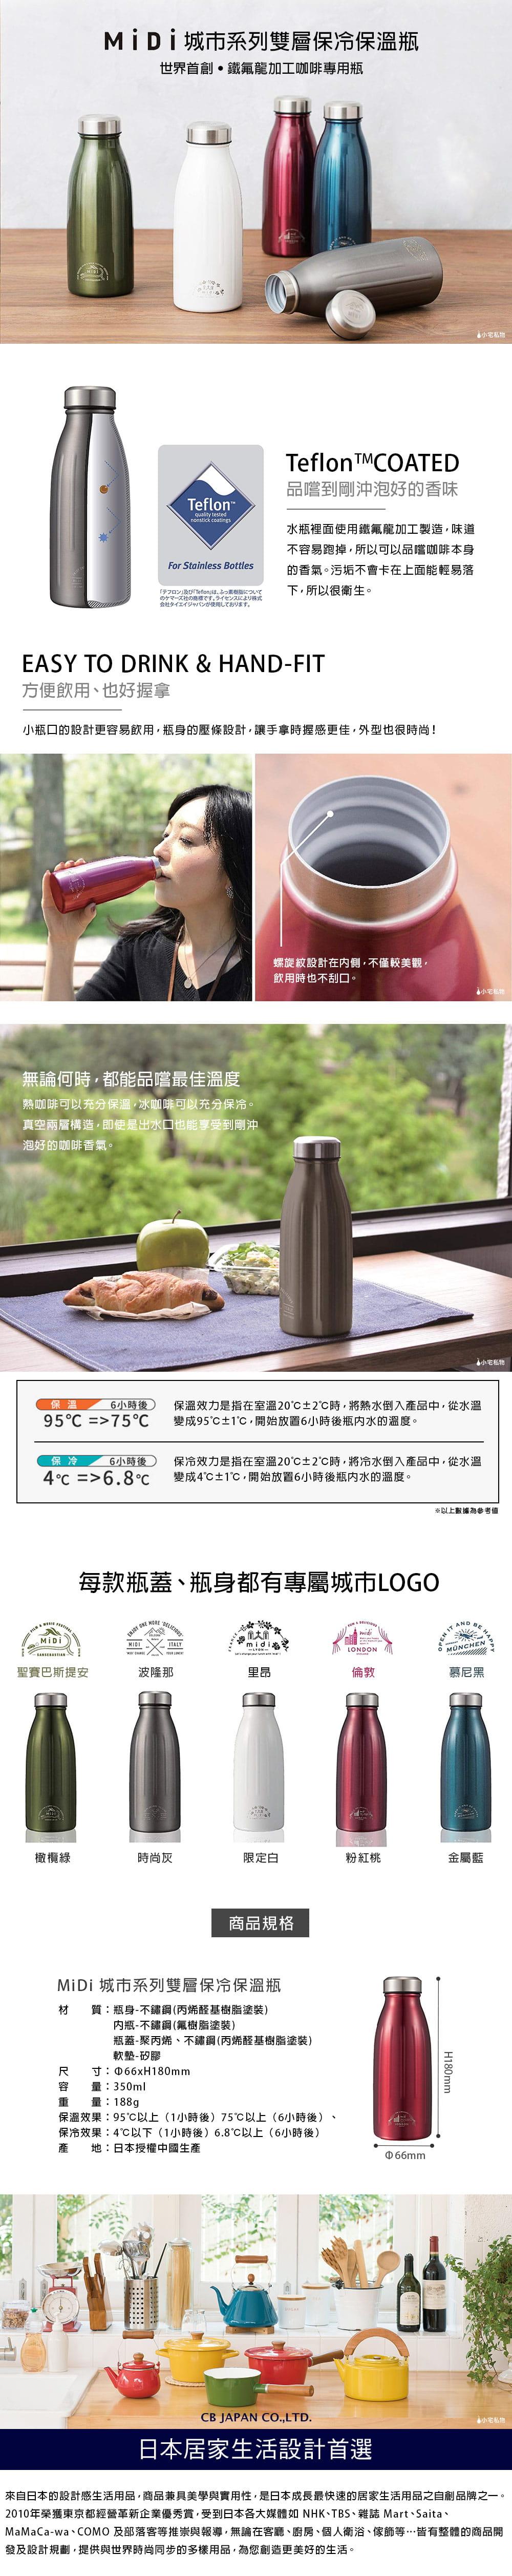 CCB Japan MiDi 城市系列雙層保冷保溫瓶350ml - 金屬藍